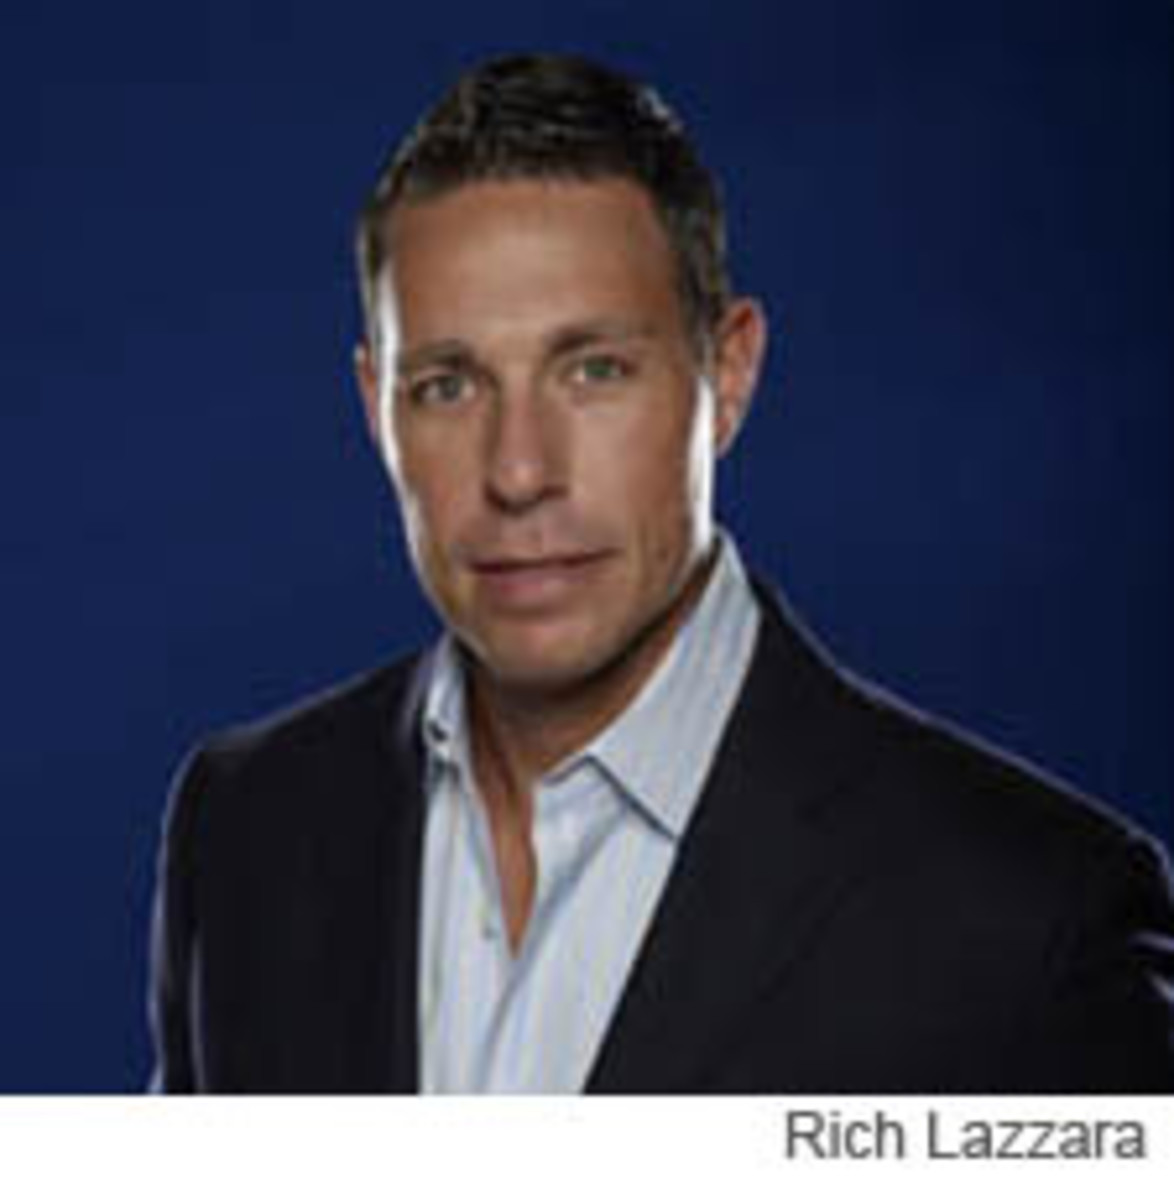 Yacht Broker: Rich Lazzara